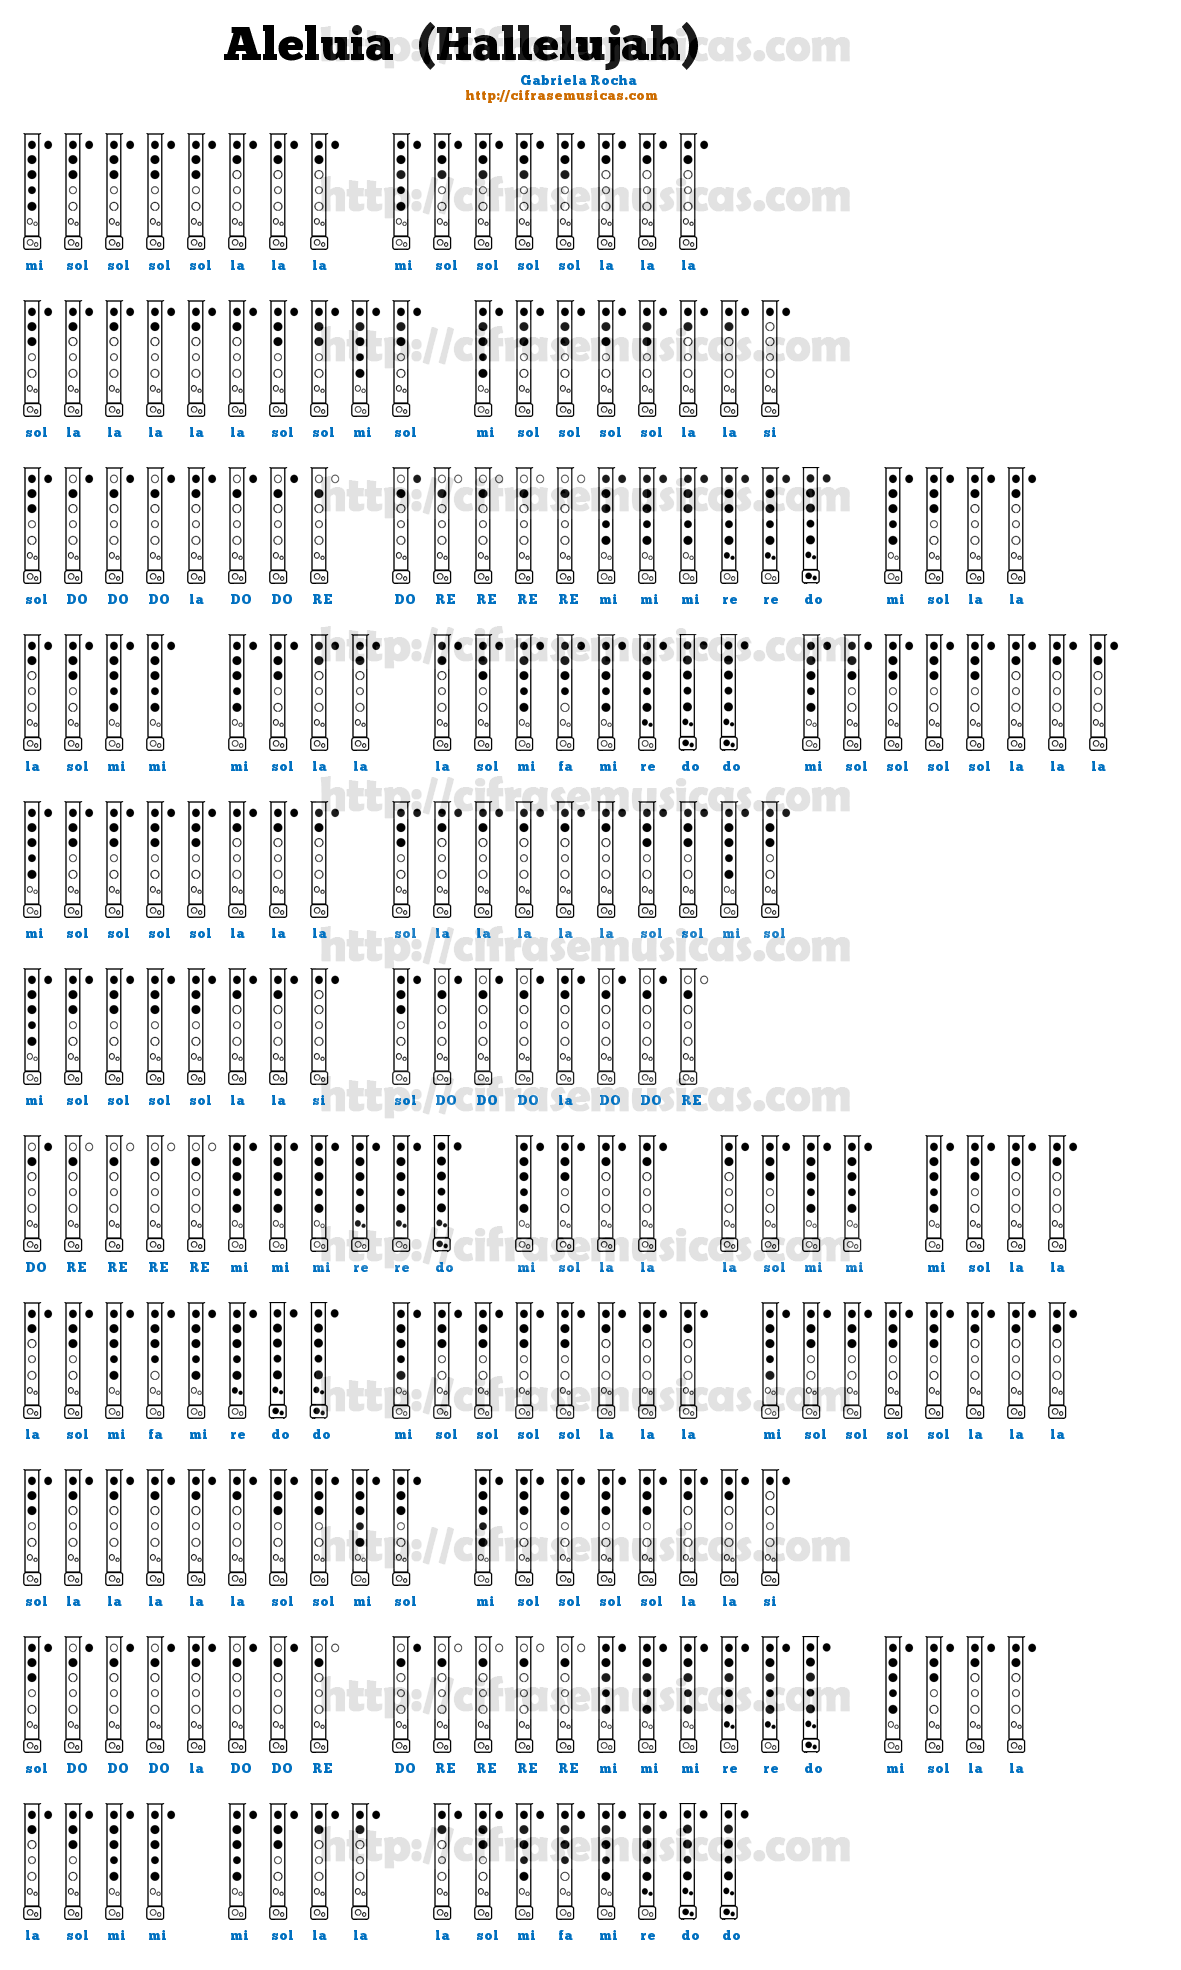 Conhecido Cifra Aleluia (Hallelujah) - Gabriela Rocha para Flauta Doce  UD02